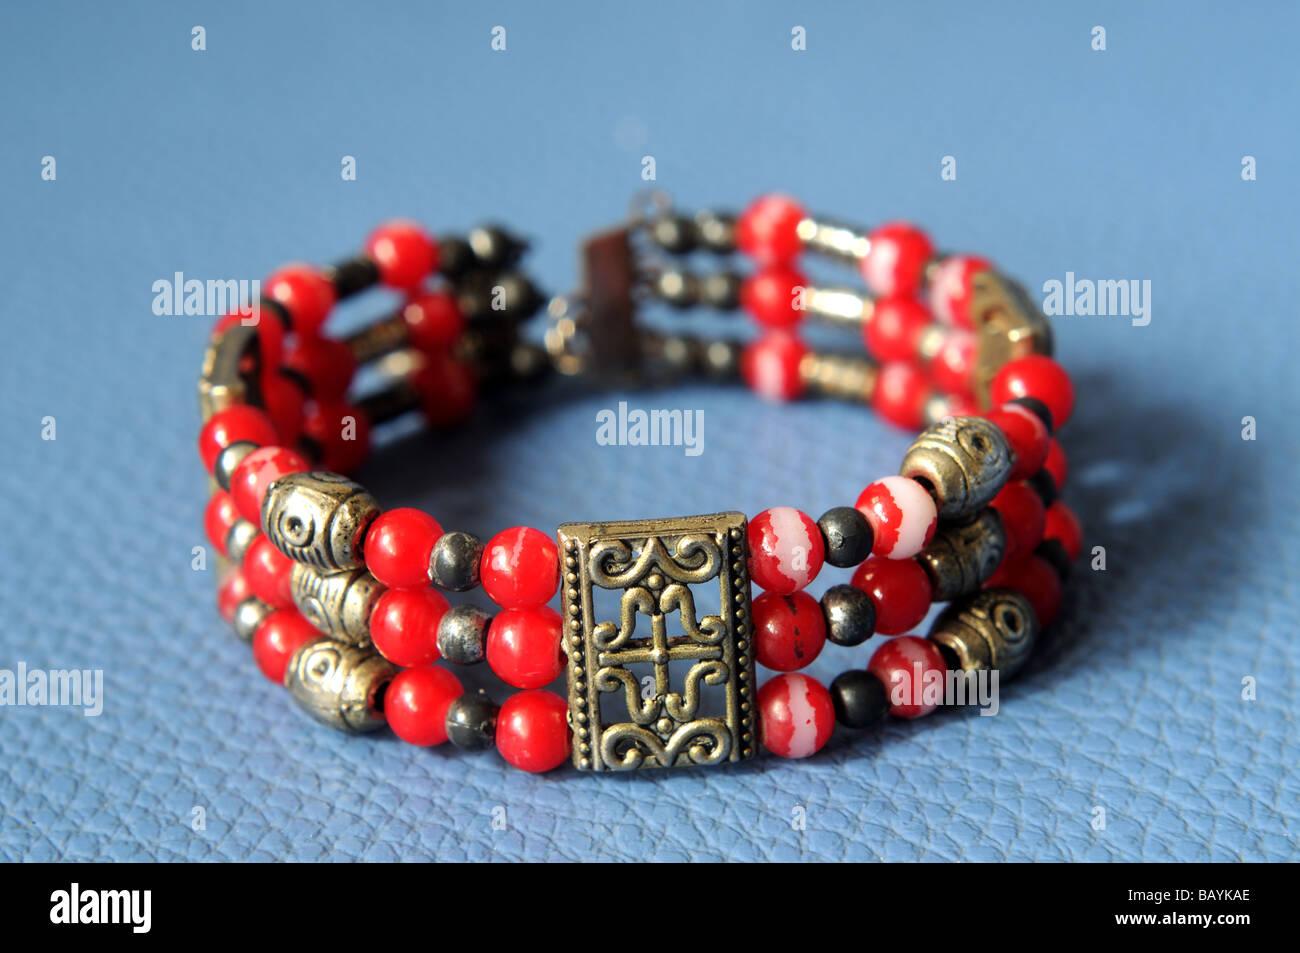 hilltribe jewellery bangkok thailand - Stock Image